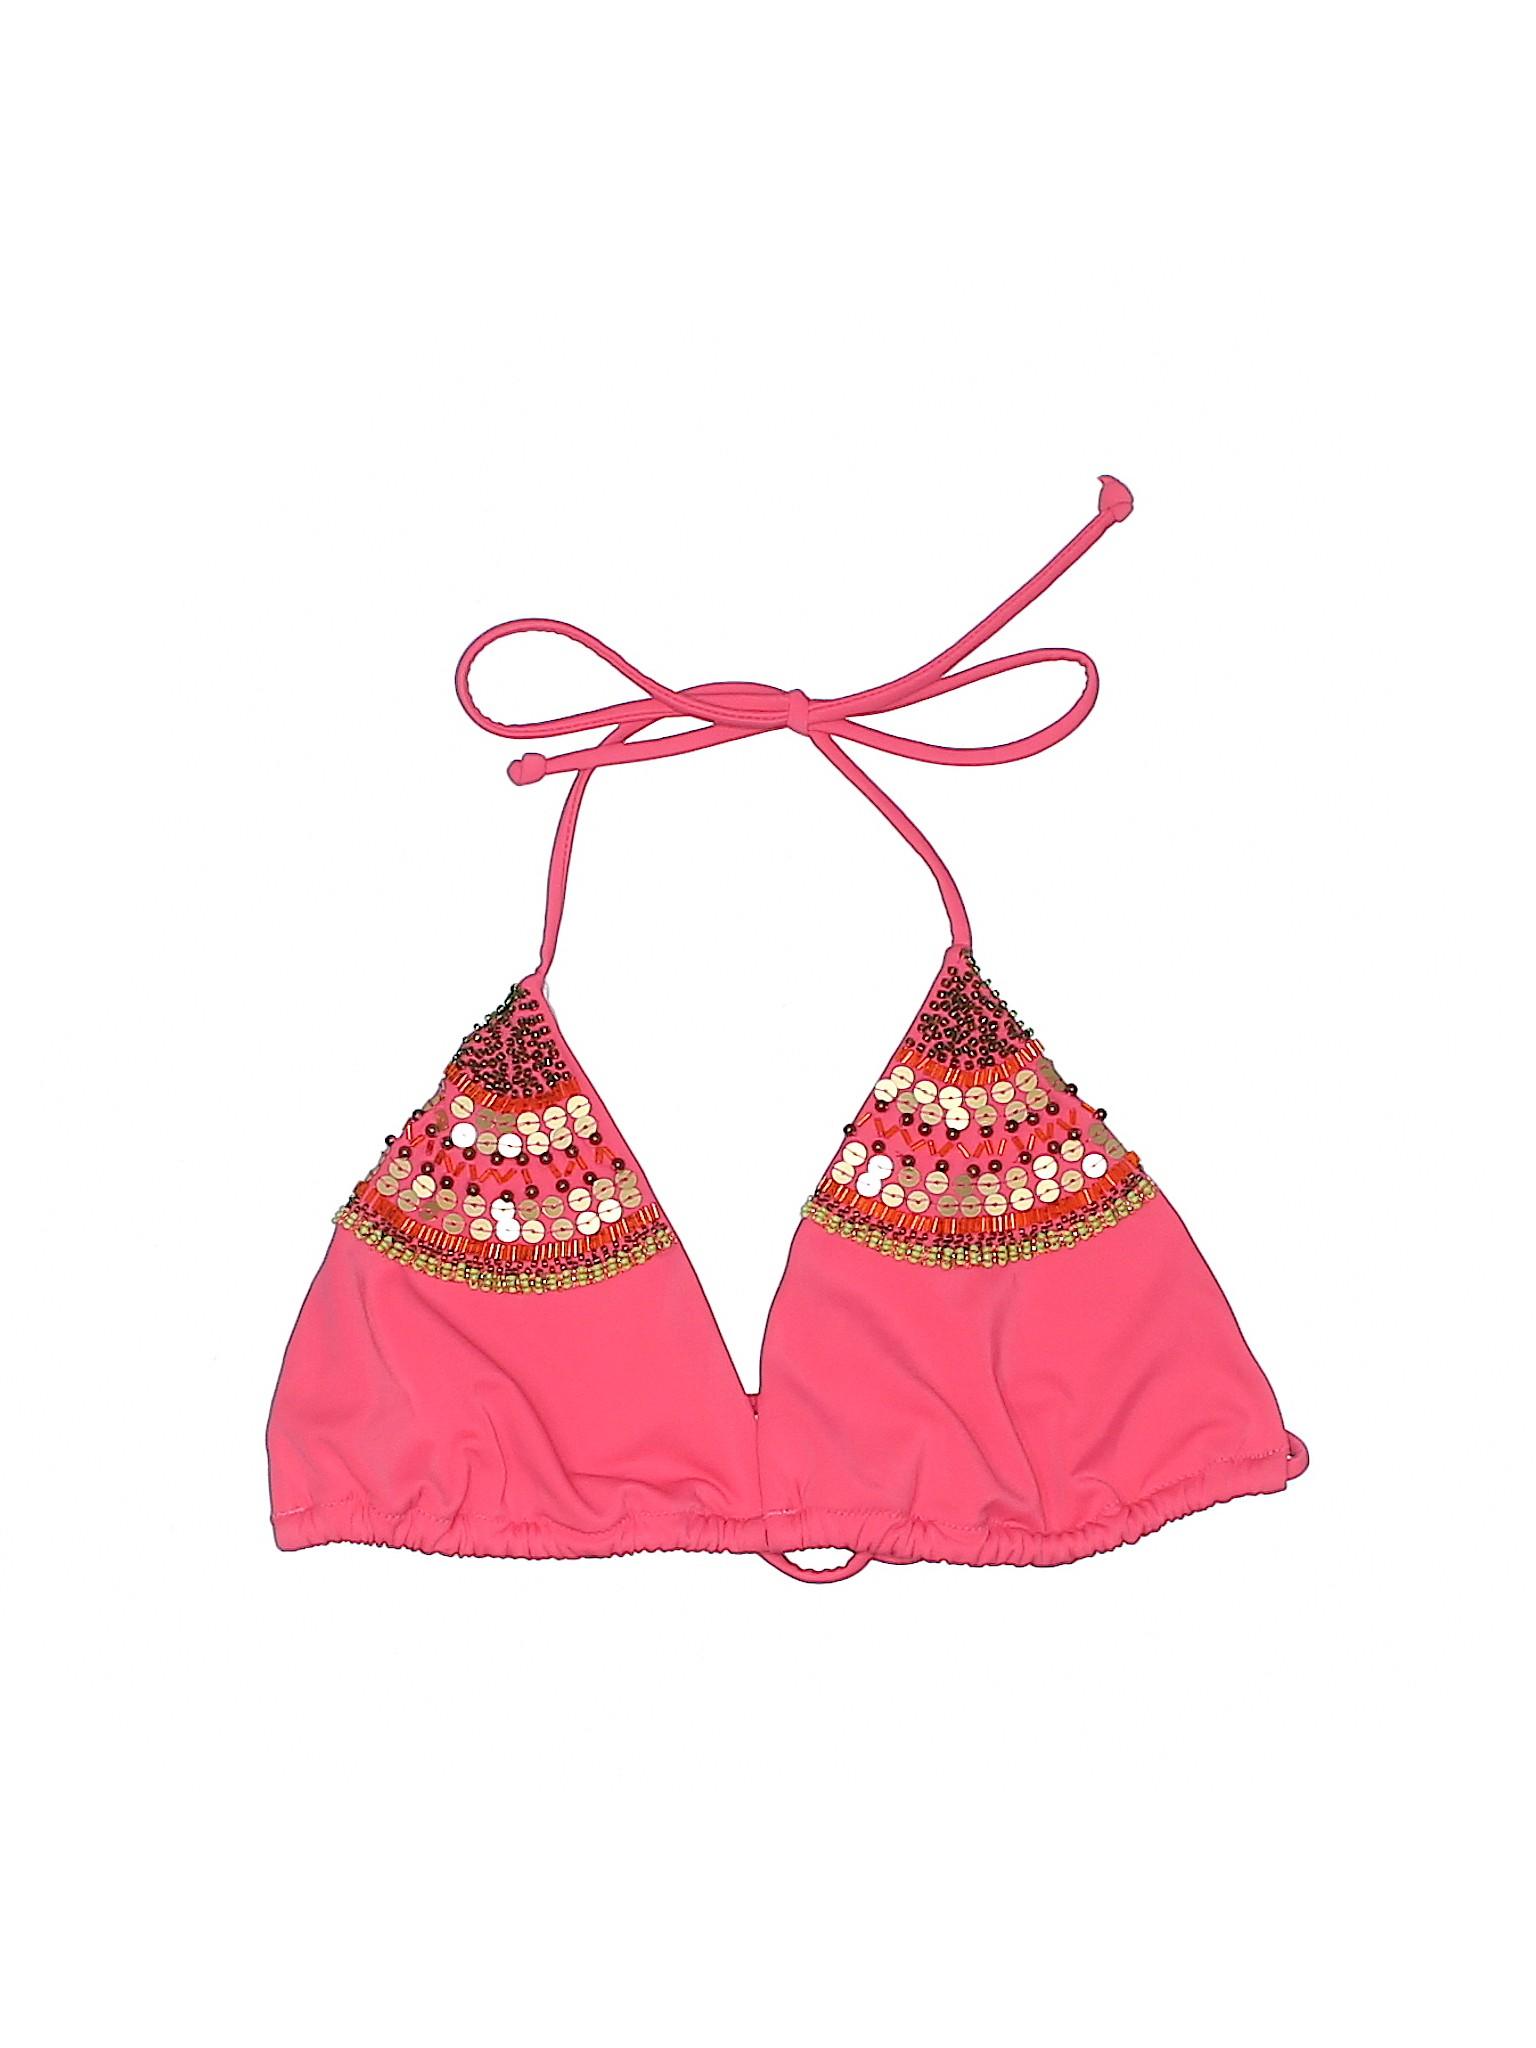 Top Boutique Victoria's Boutique Victoria's Secret Swimsuit Victoria's Swimsuit Top Boutique Secret 44nBqxv